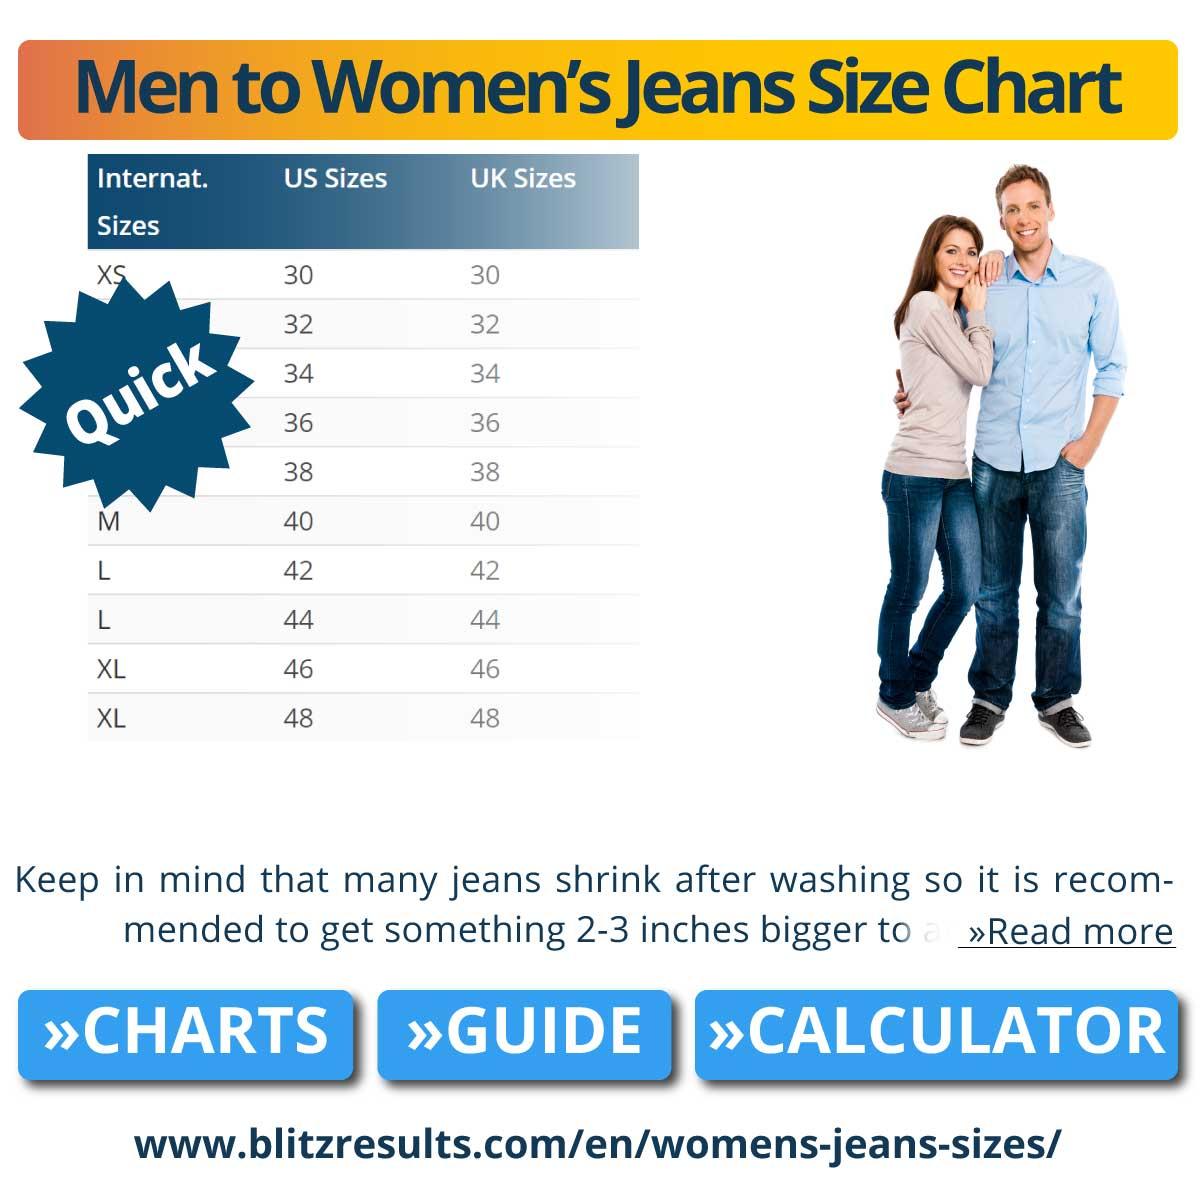 Men to Women's Jeans Size Chart